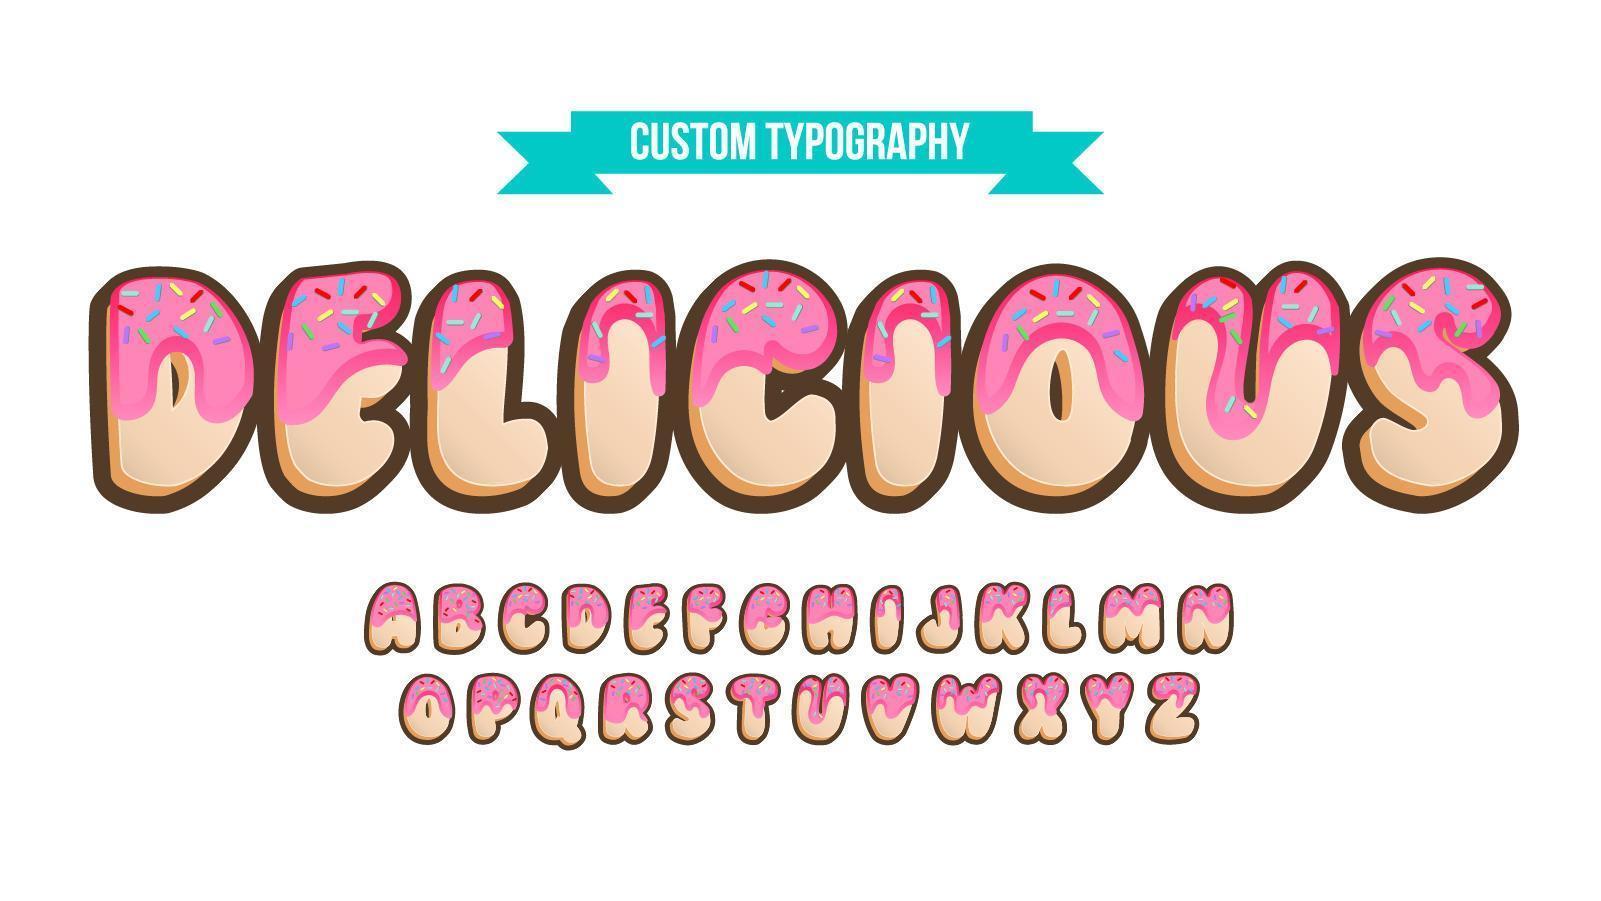 Donut Custom Typography  vector